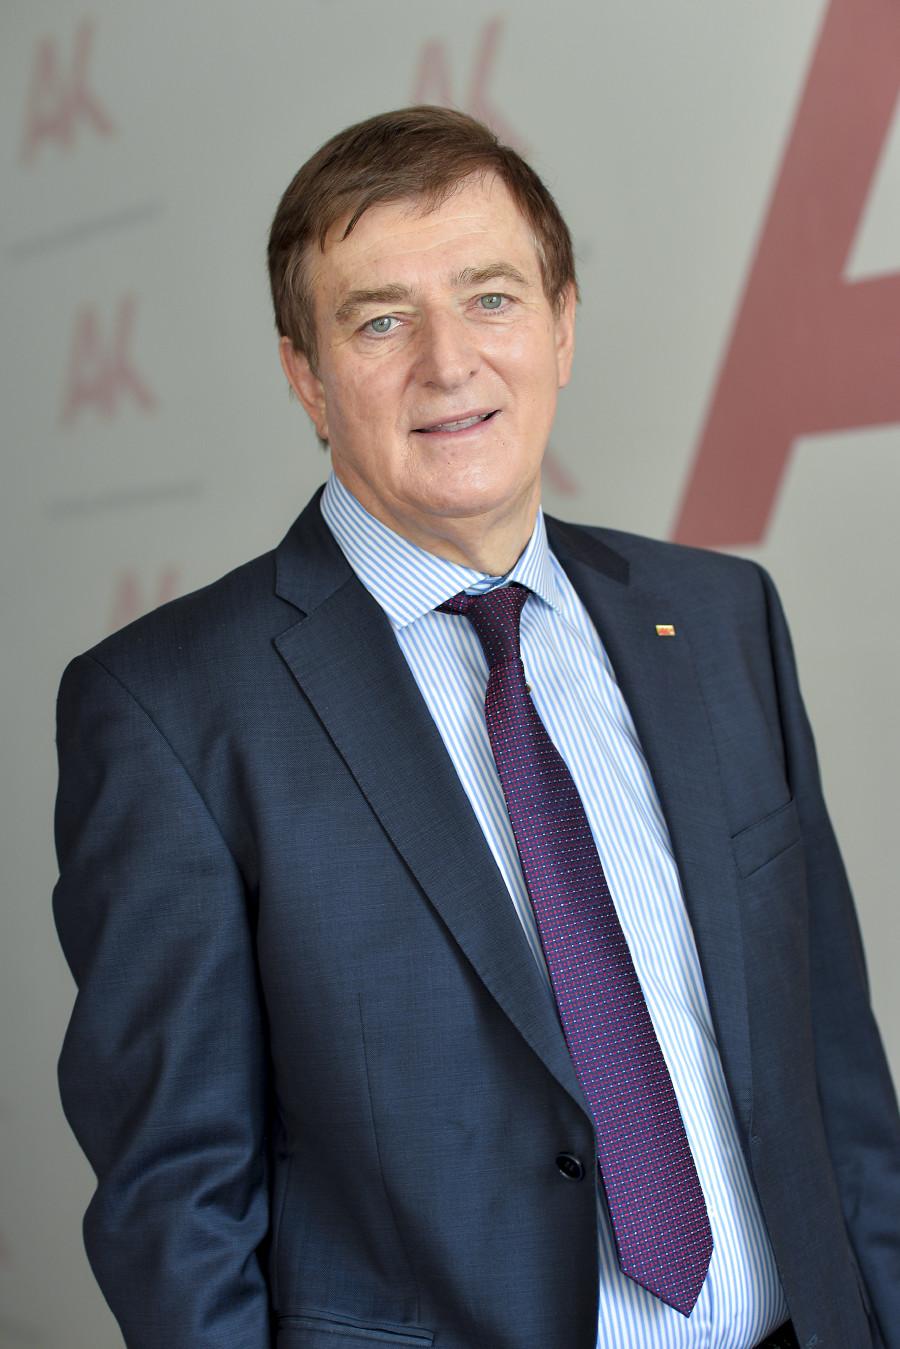 AK-Präsident Günther Goach © Helge Bauer, AK Kärnten